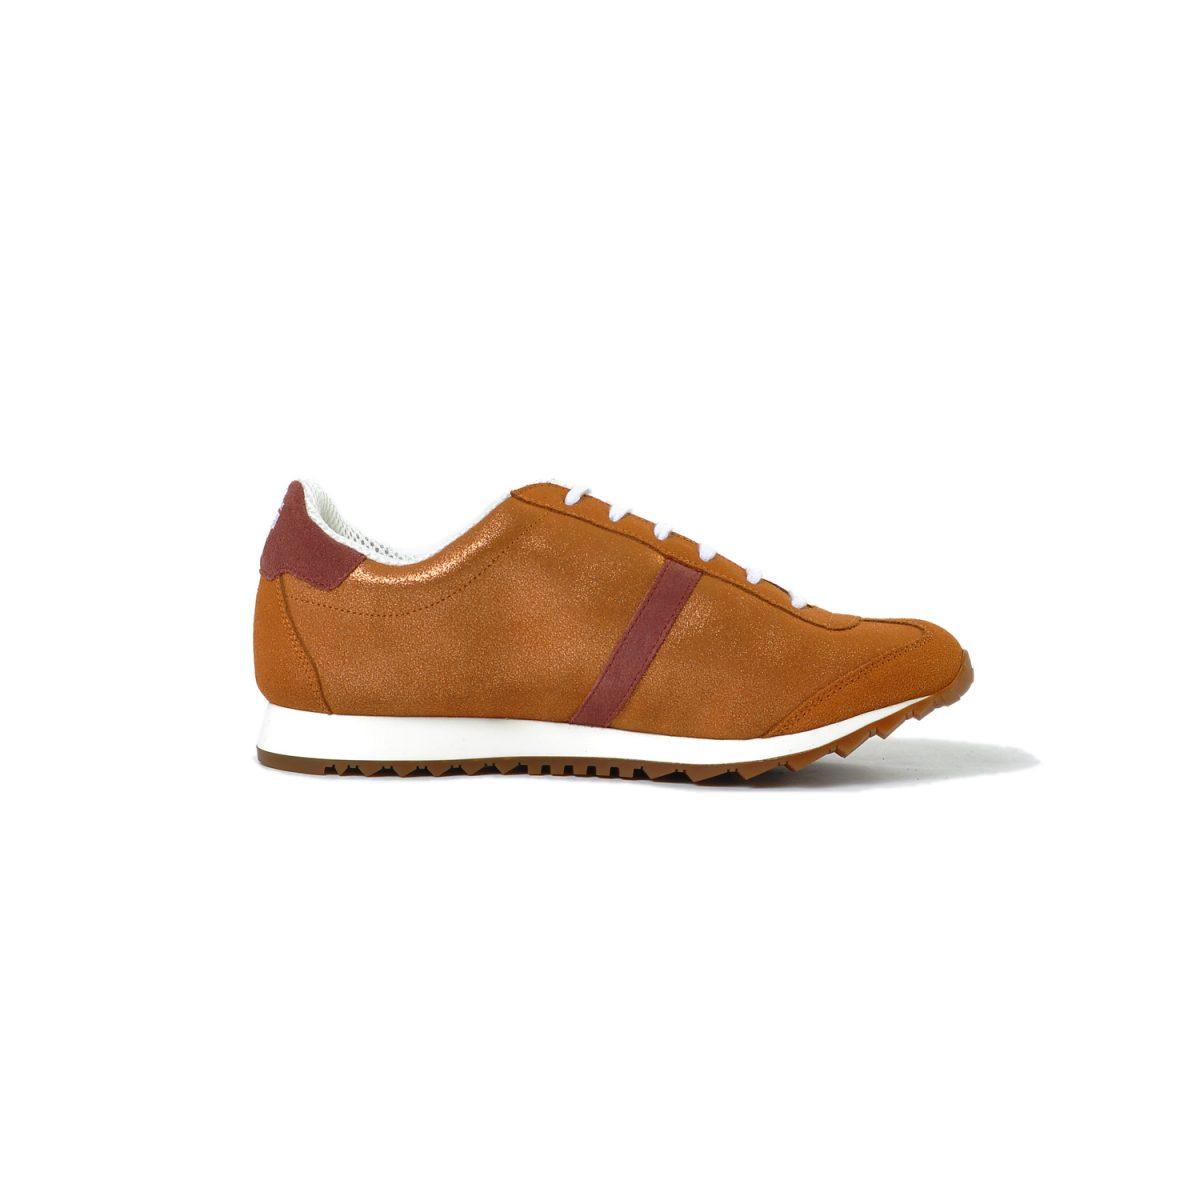 Tisza shoes - Martfű - Rosegold-maroon